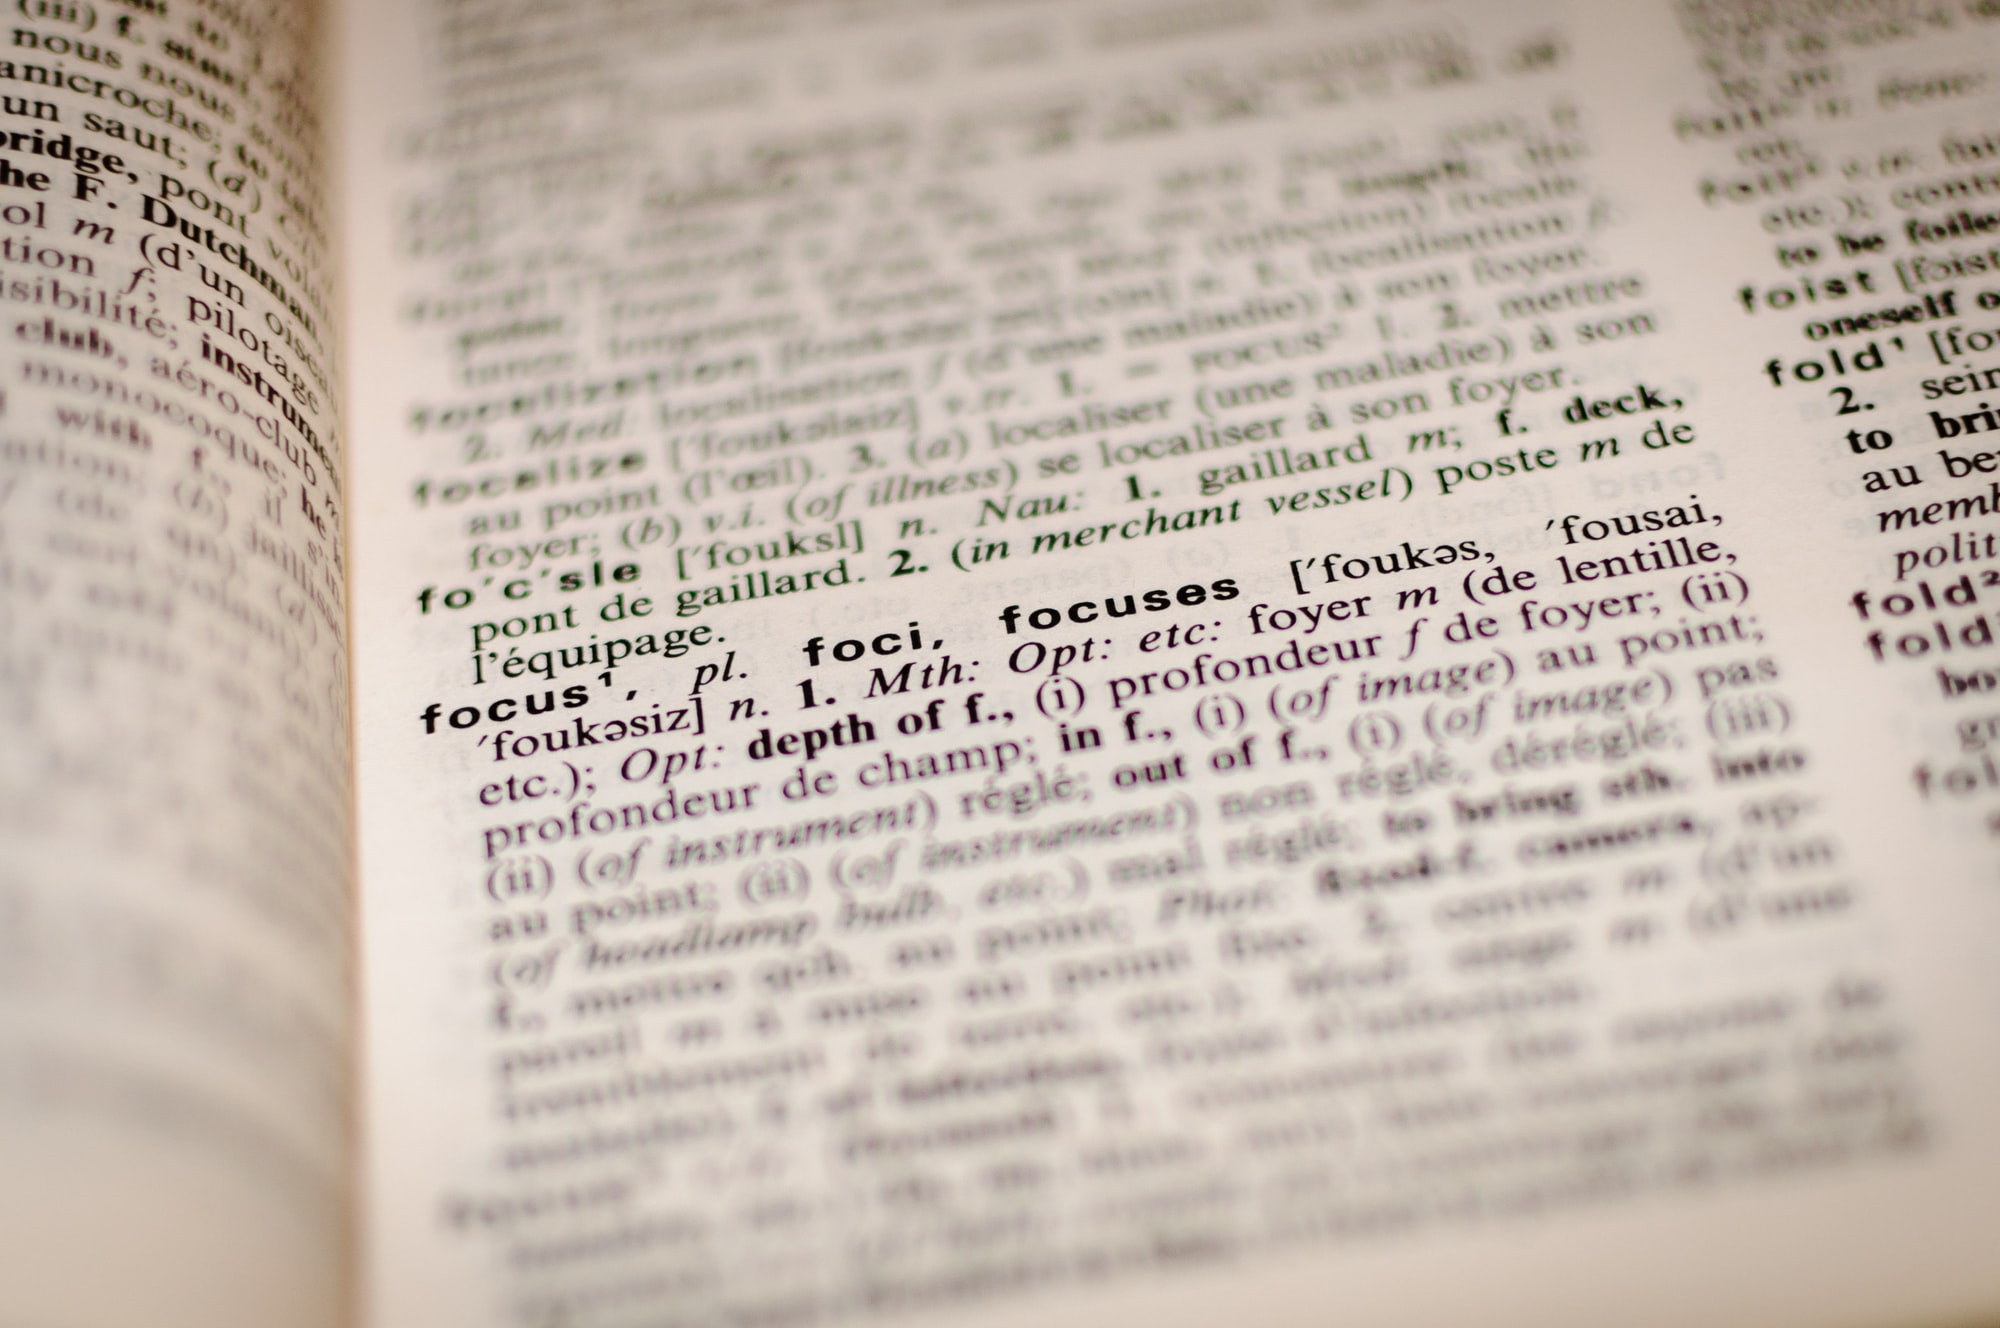 Focus definition